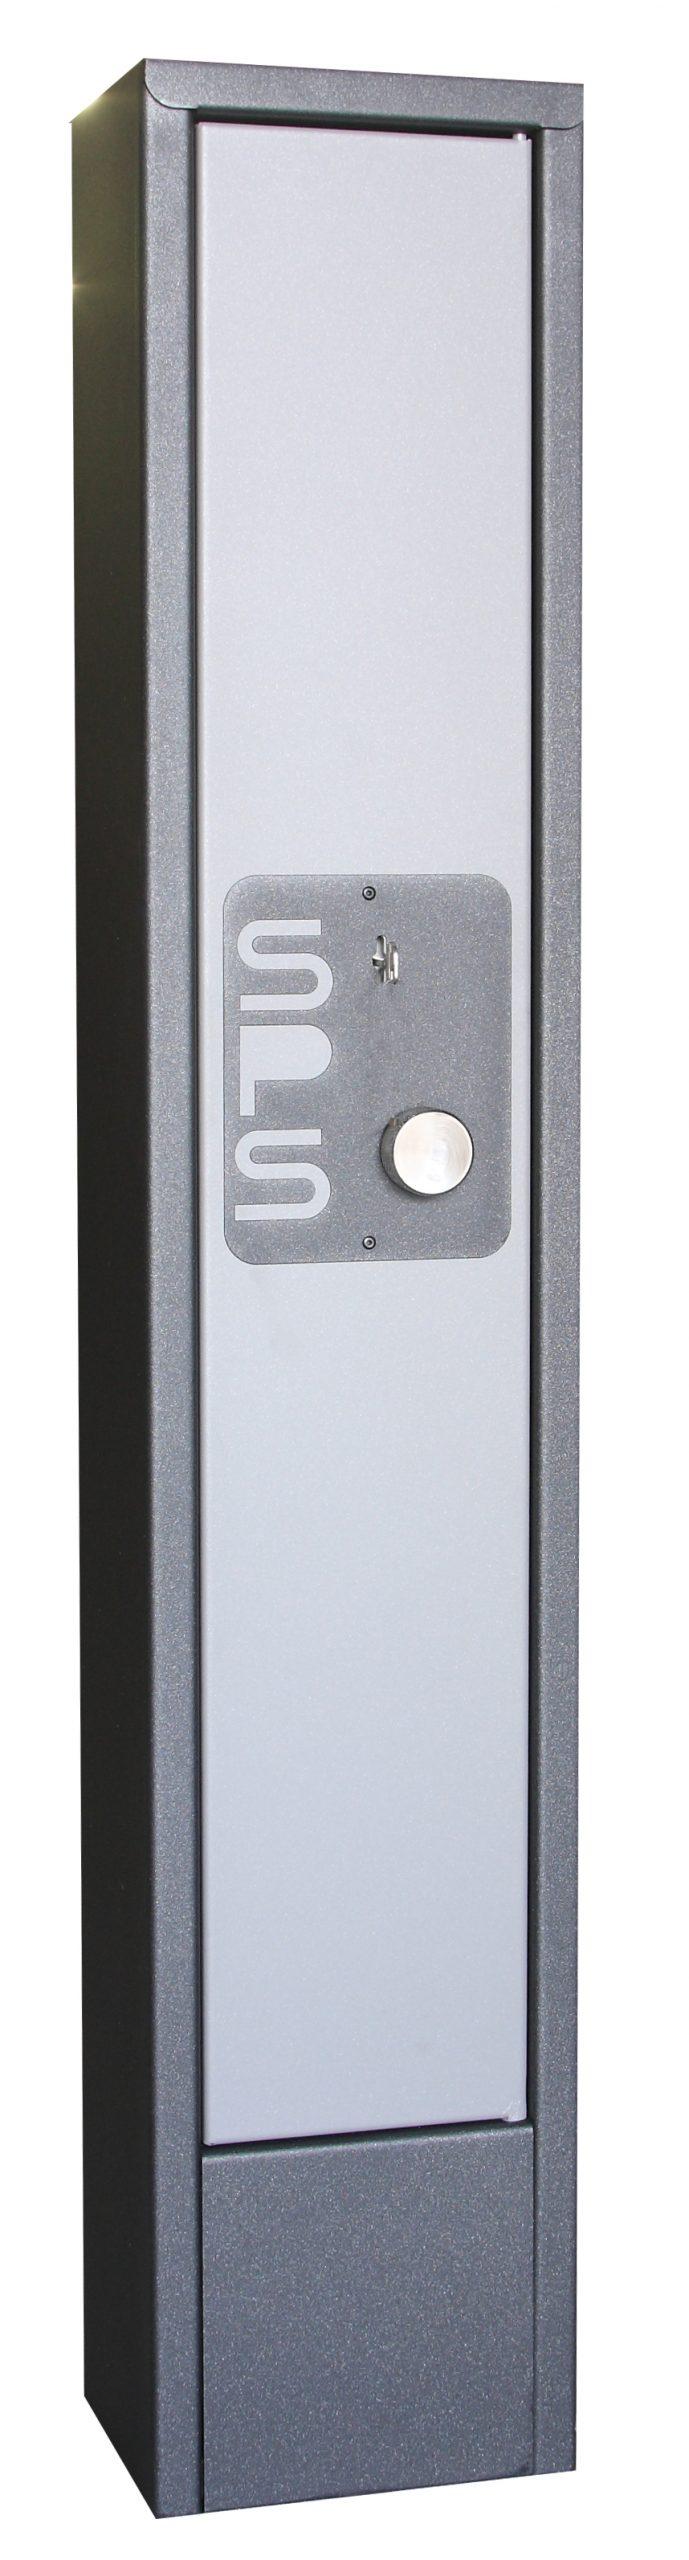 Armero SPS modelo AP401